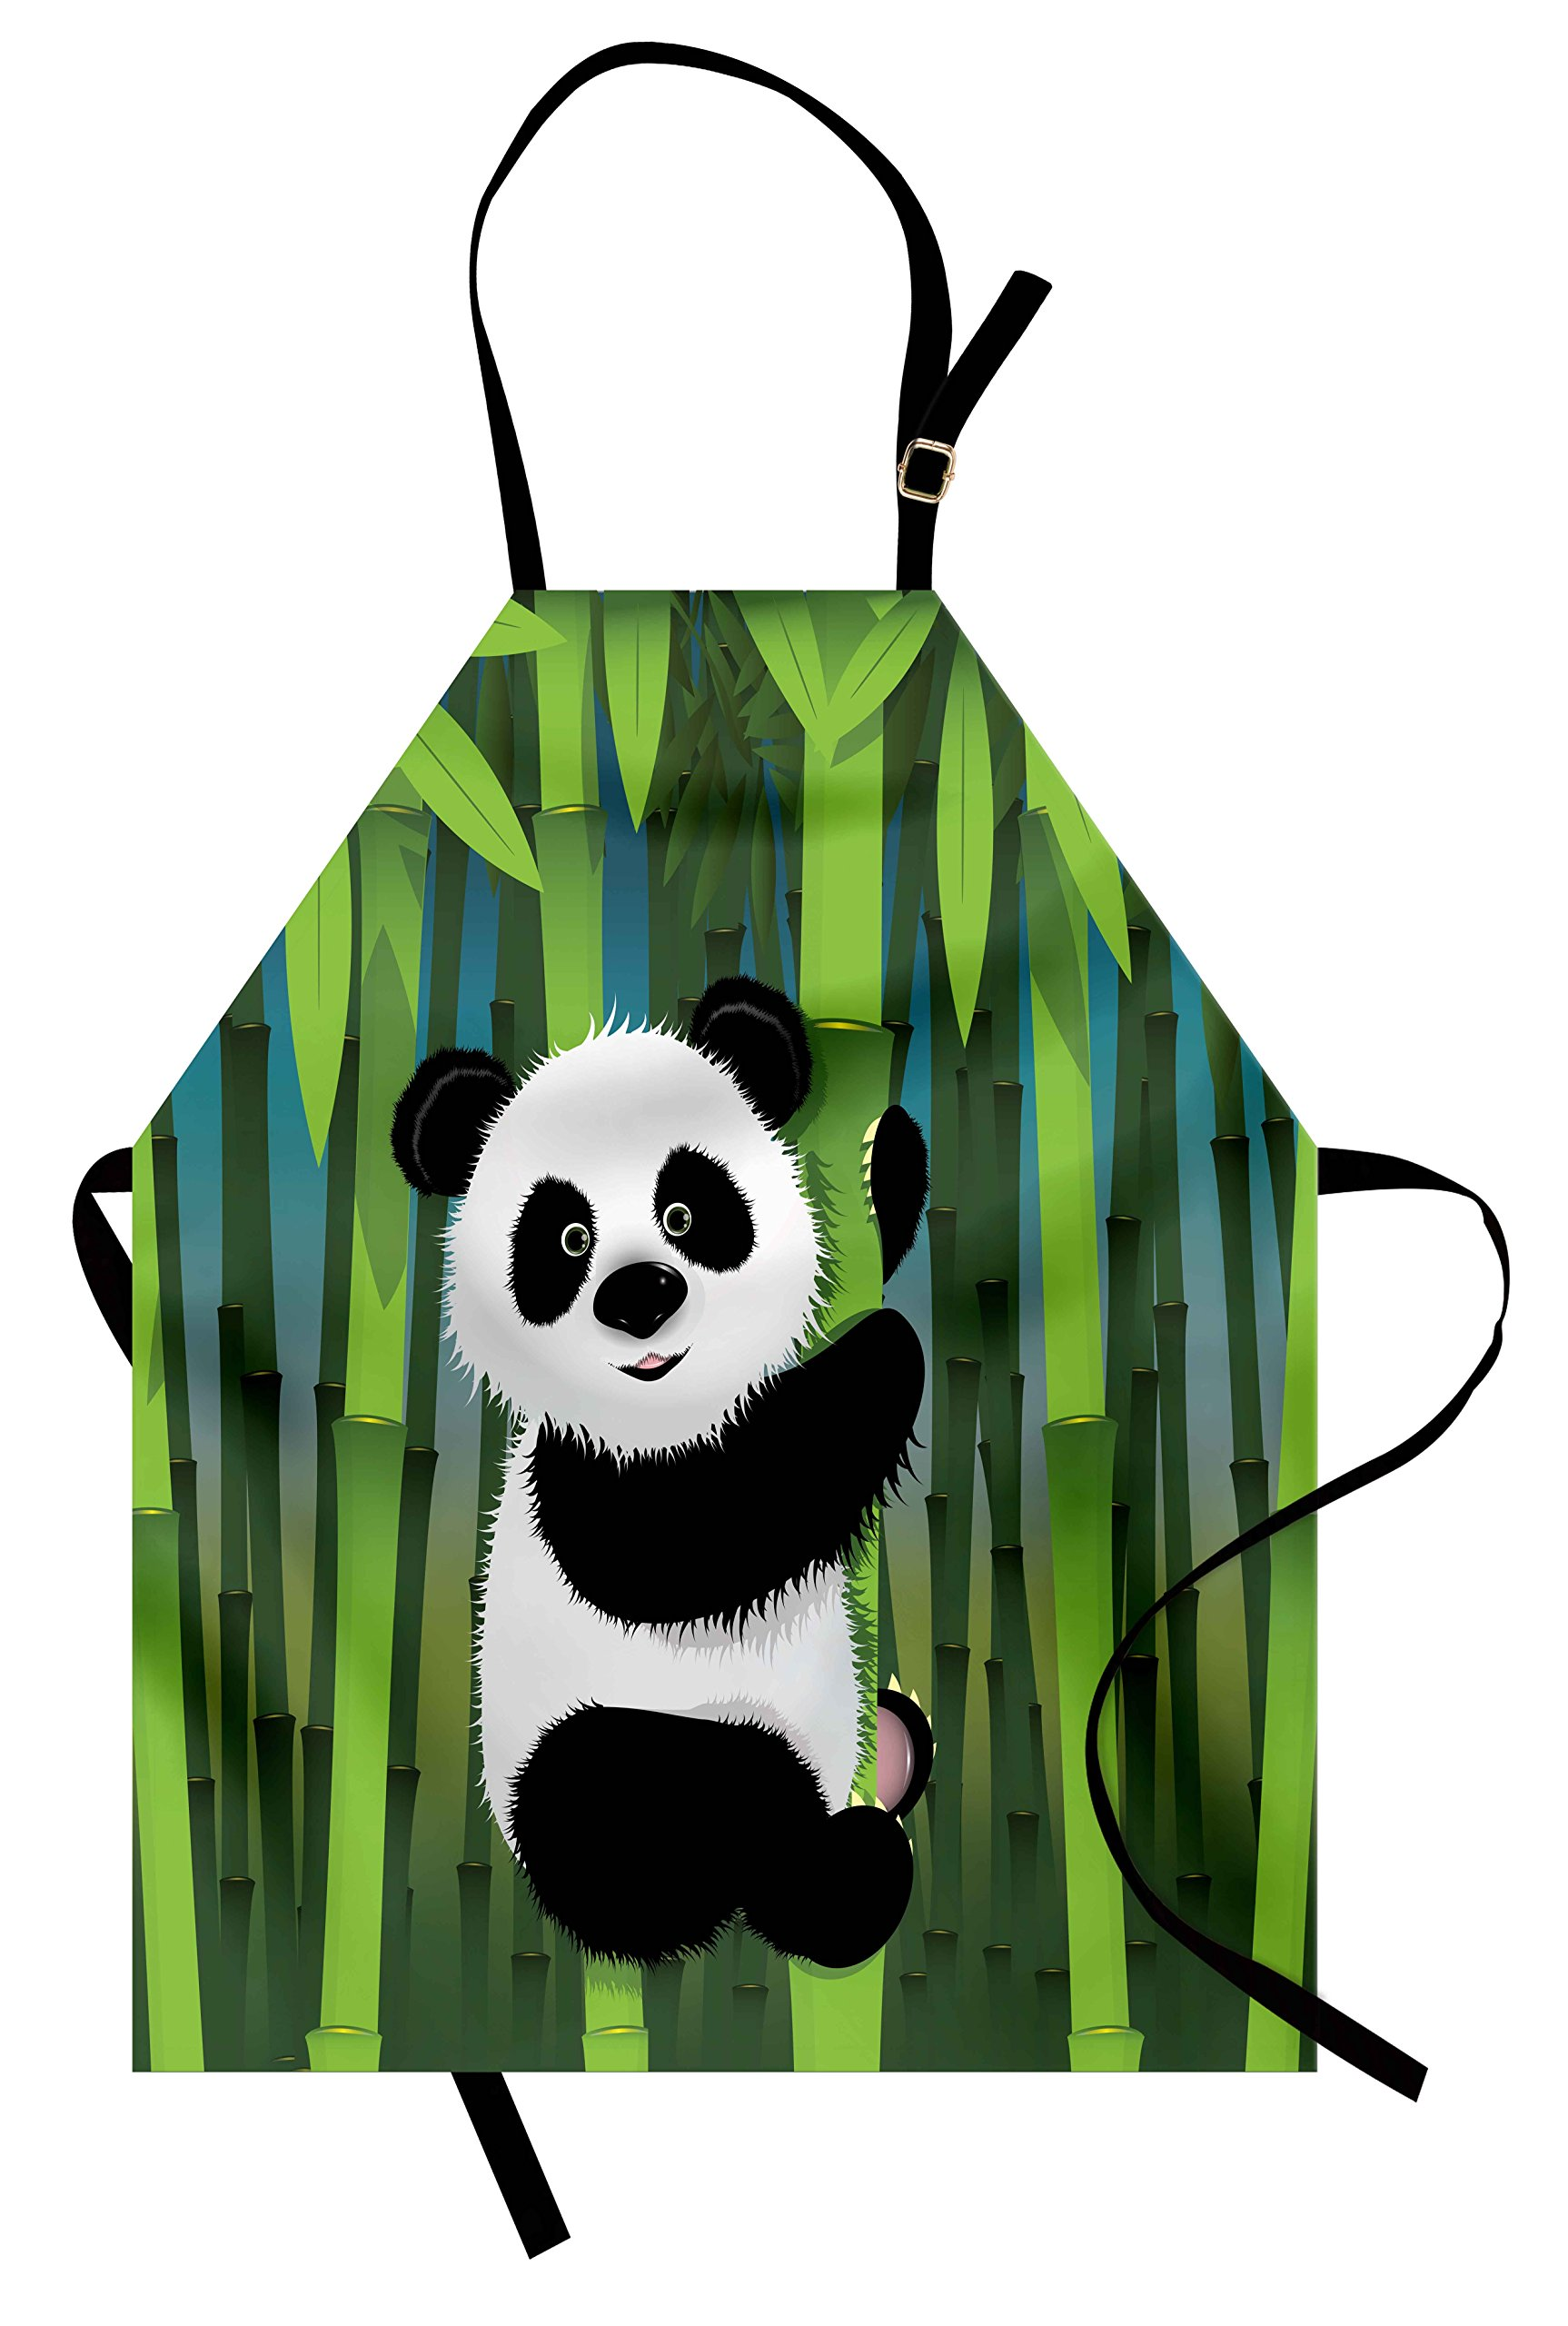 Lunarable Cartoon Apron, Curious Baby Panda on Stem of the Bamboo Bear Jungle Wood Illustration, Unisex Kitchen Bib Apron with Adjustable Neck for Cooking Baking Gardening, Fern Green Black White